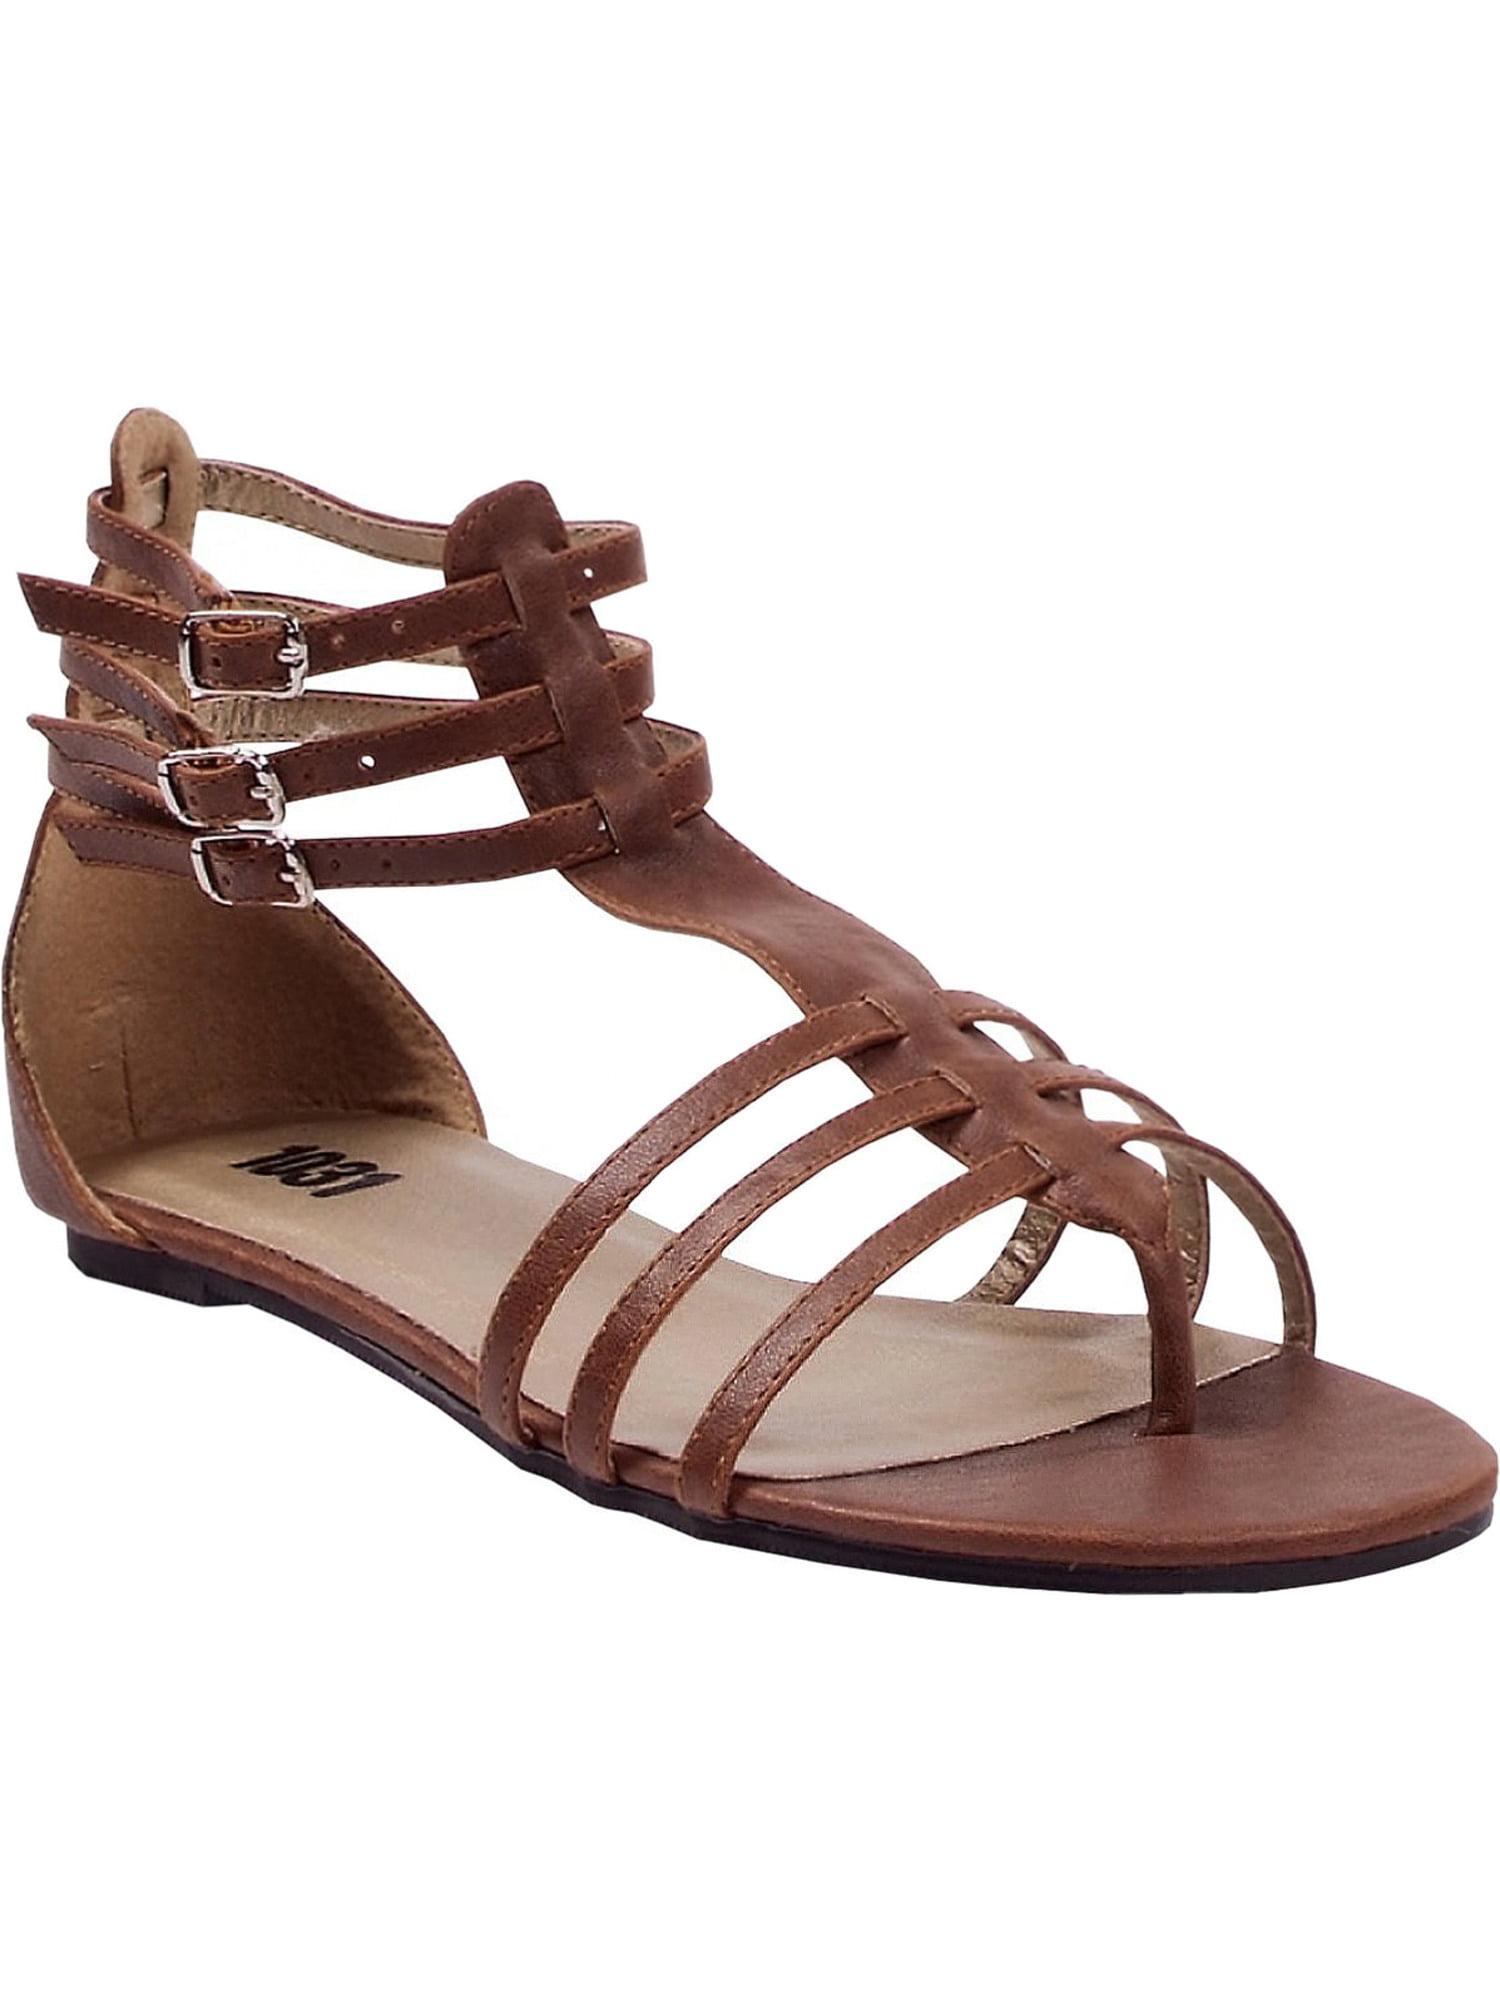 Gold Roman Sandal Womens Shoes Gladiator Flat Shoe Theatre Costumes Accessory